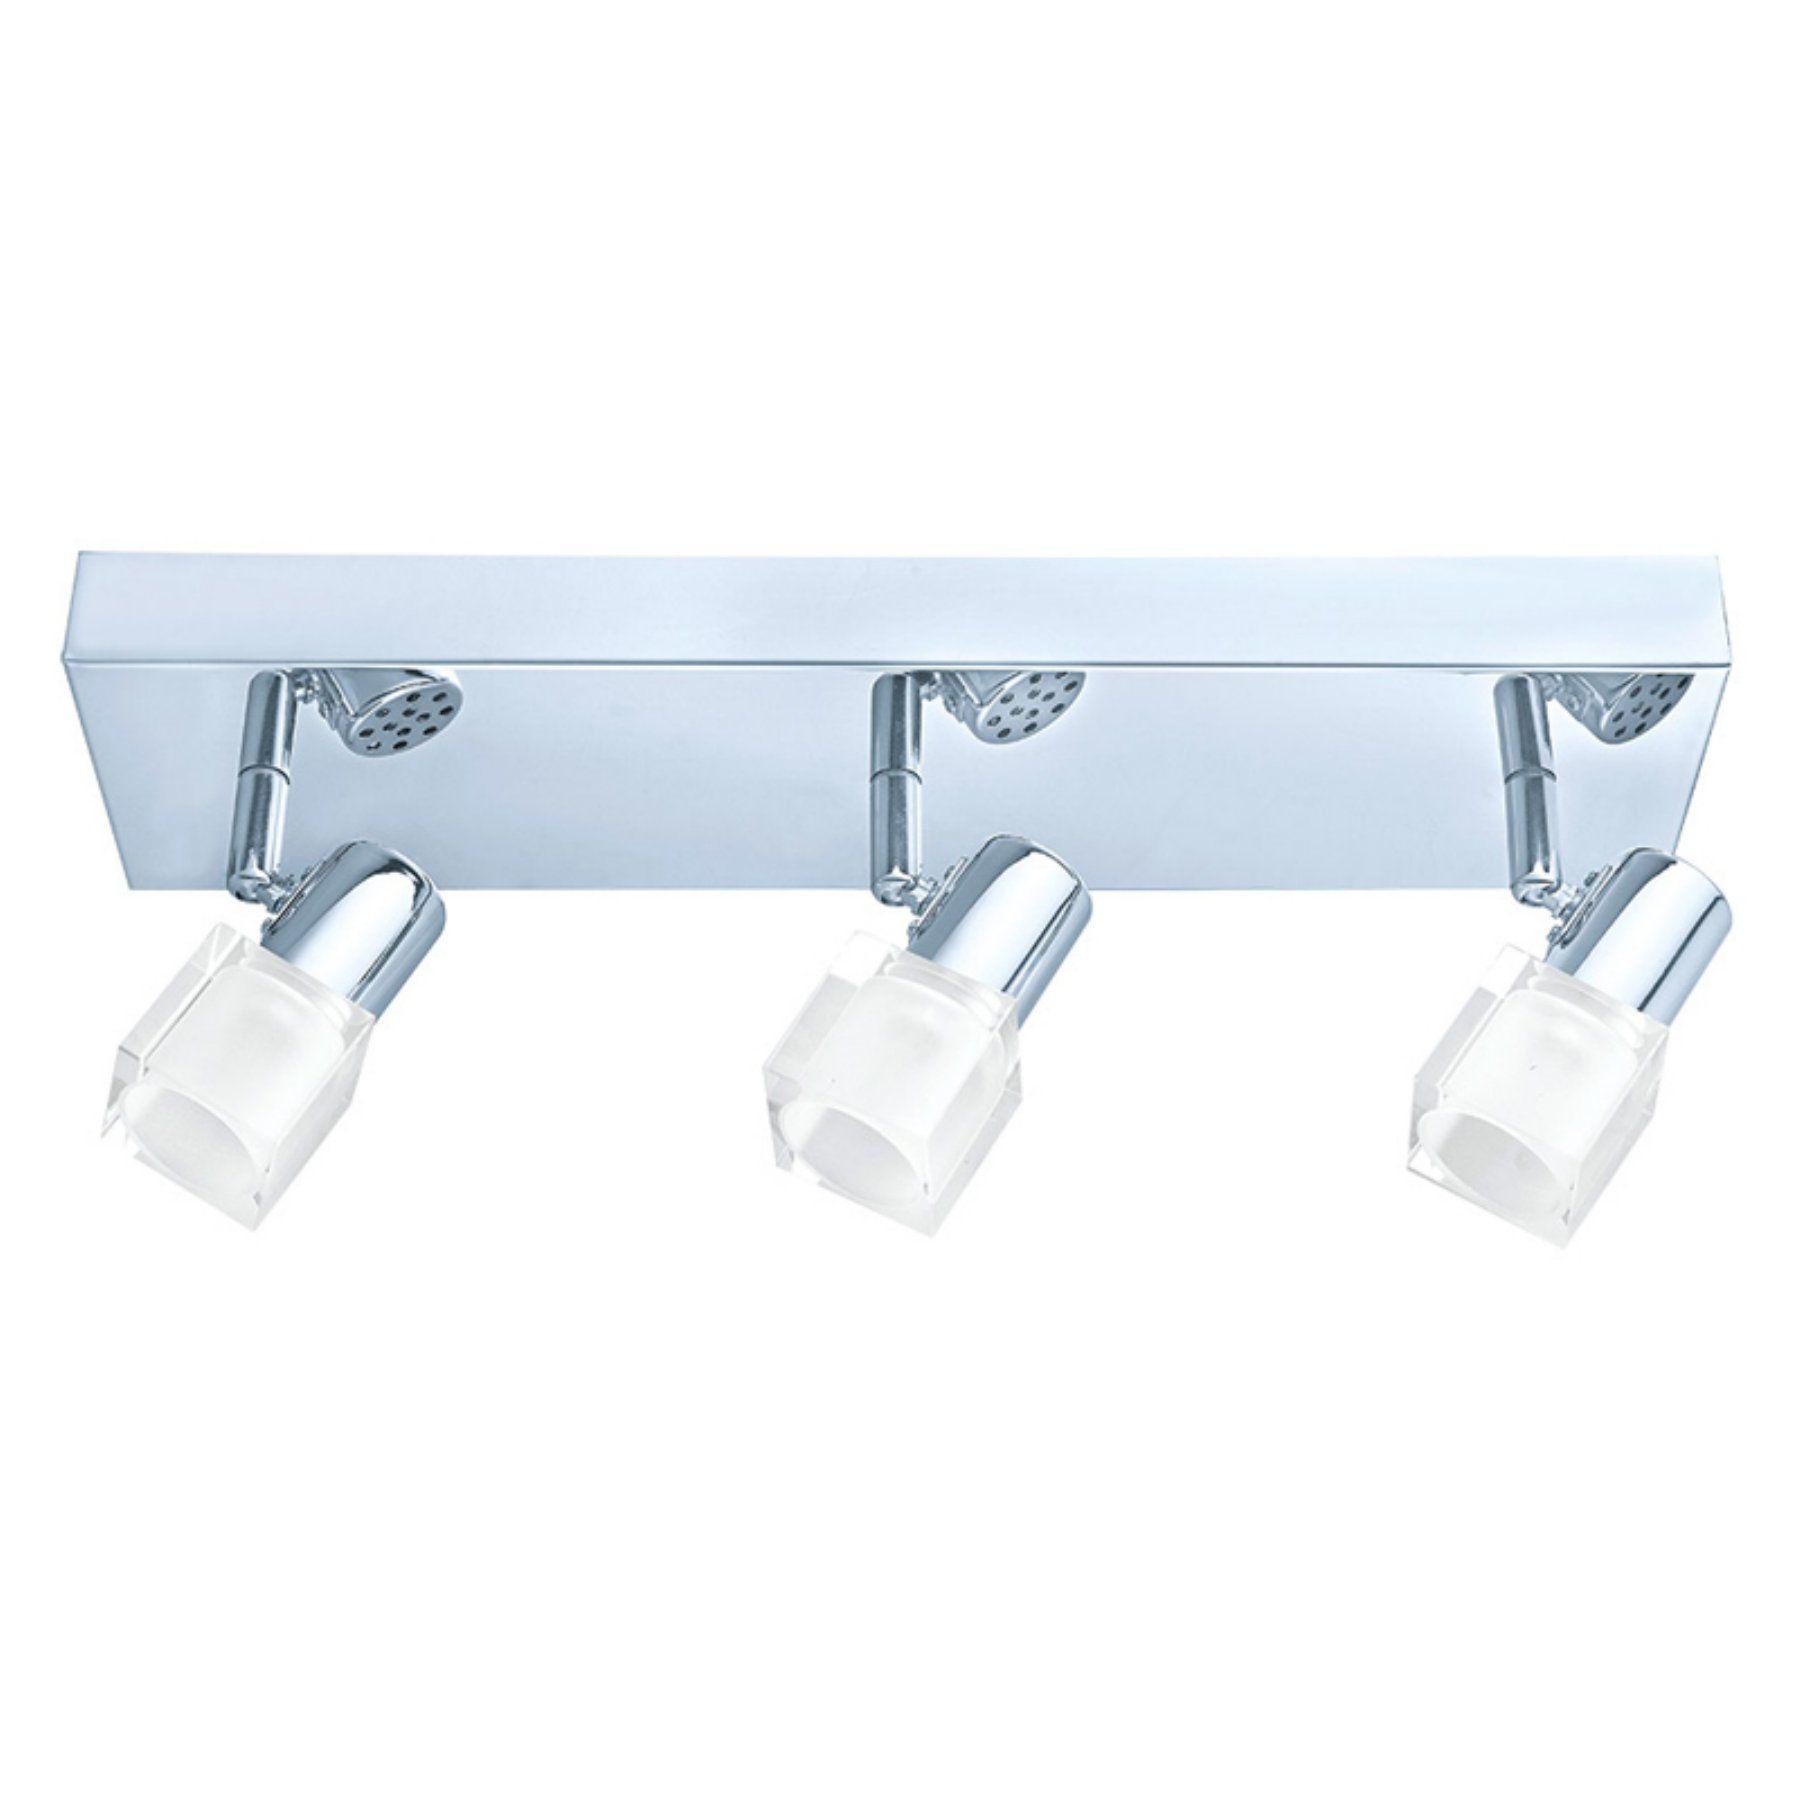 Eglo USA Norcera 3 Light LED Track Light A